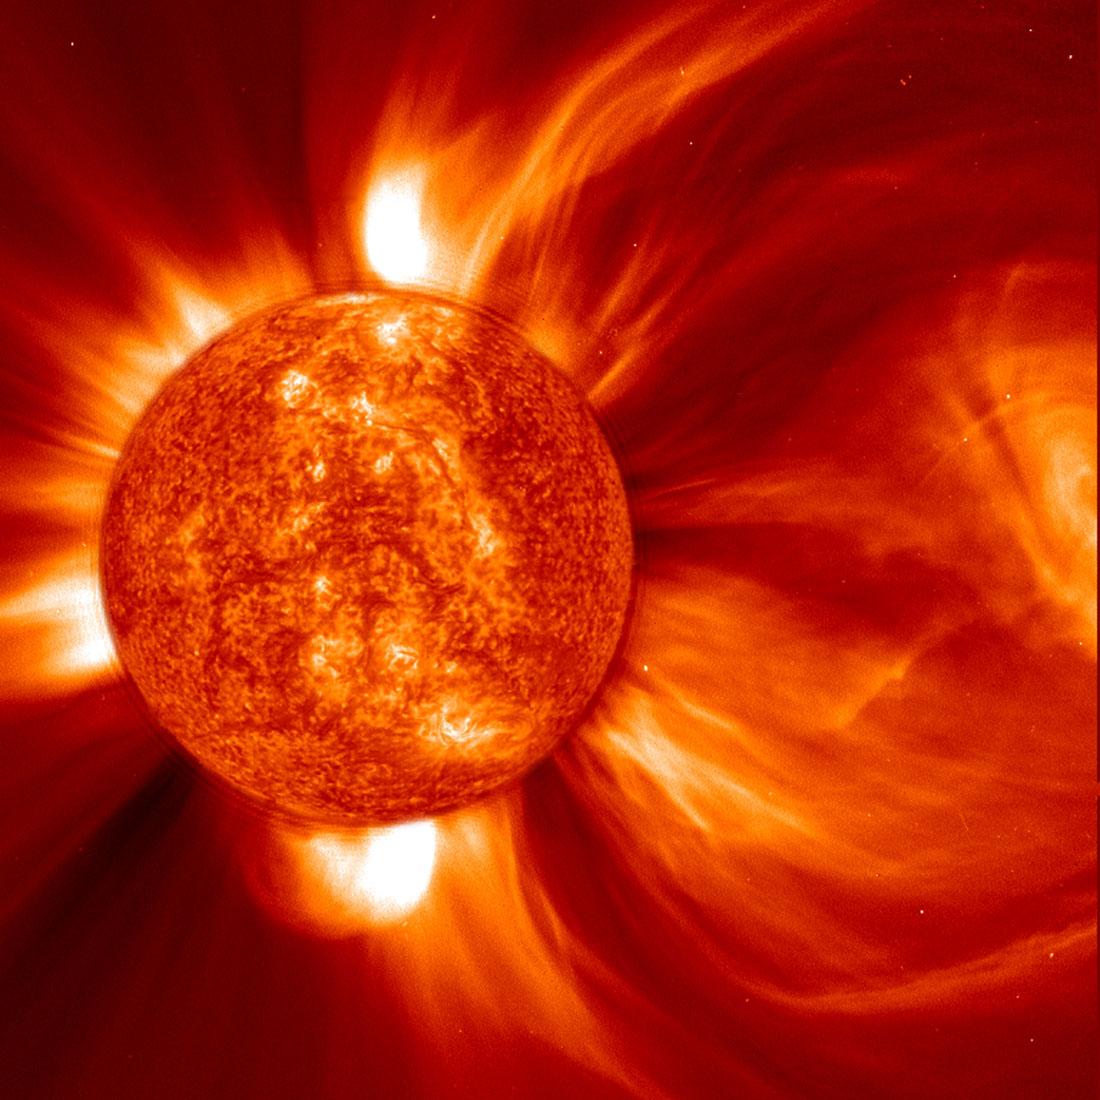 Le-Soleil-et-sa-couronne.jpg